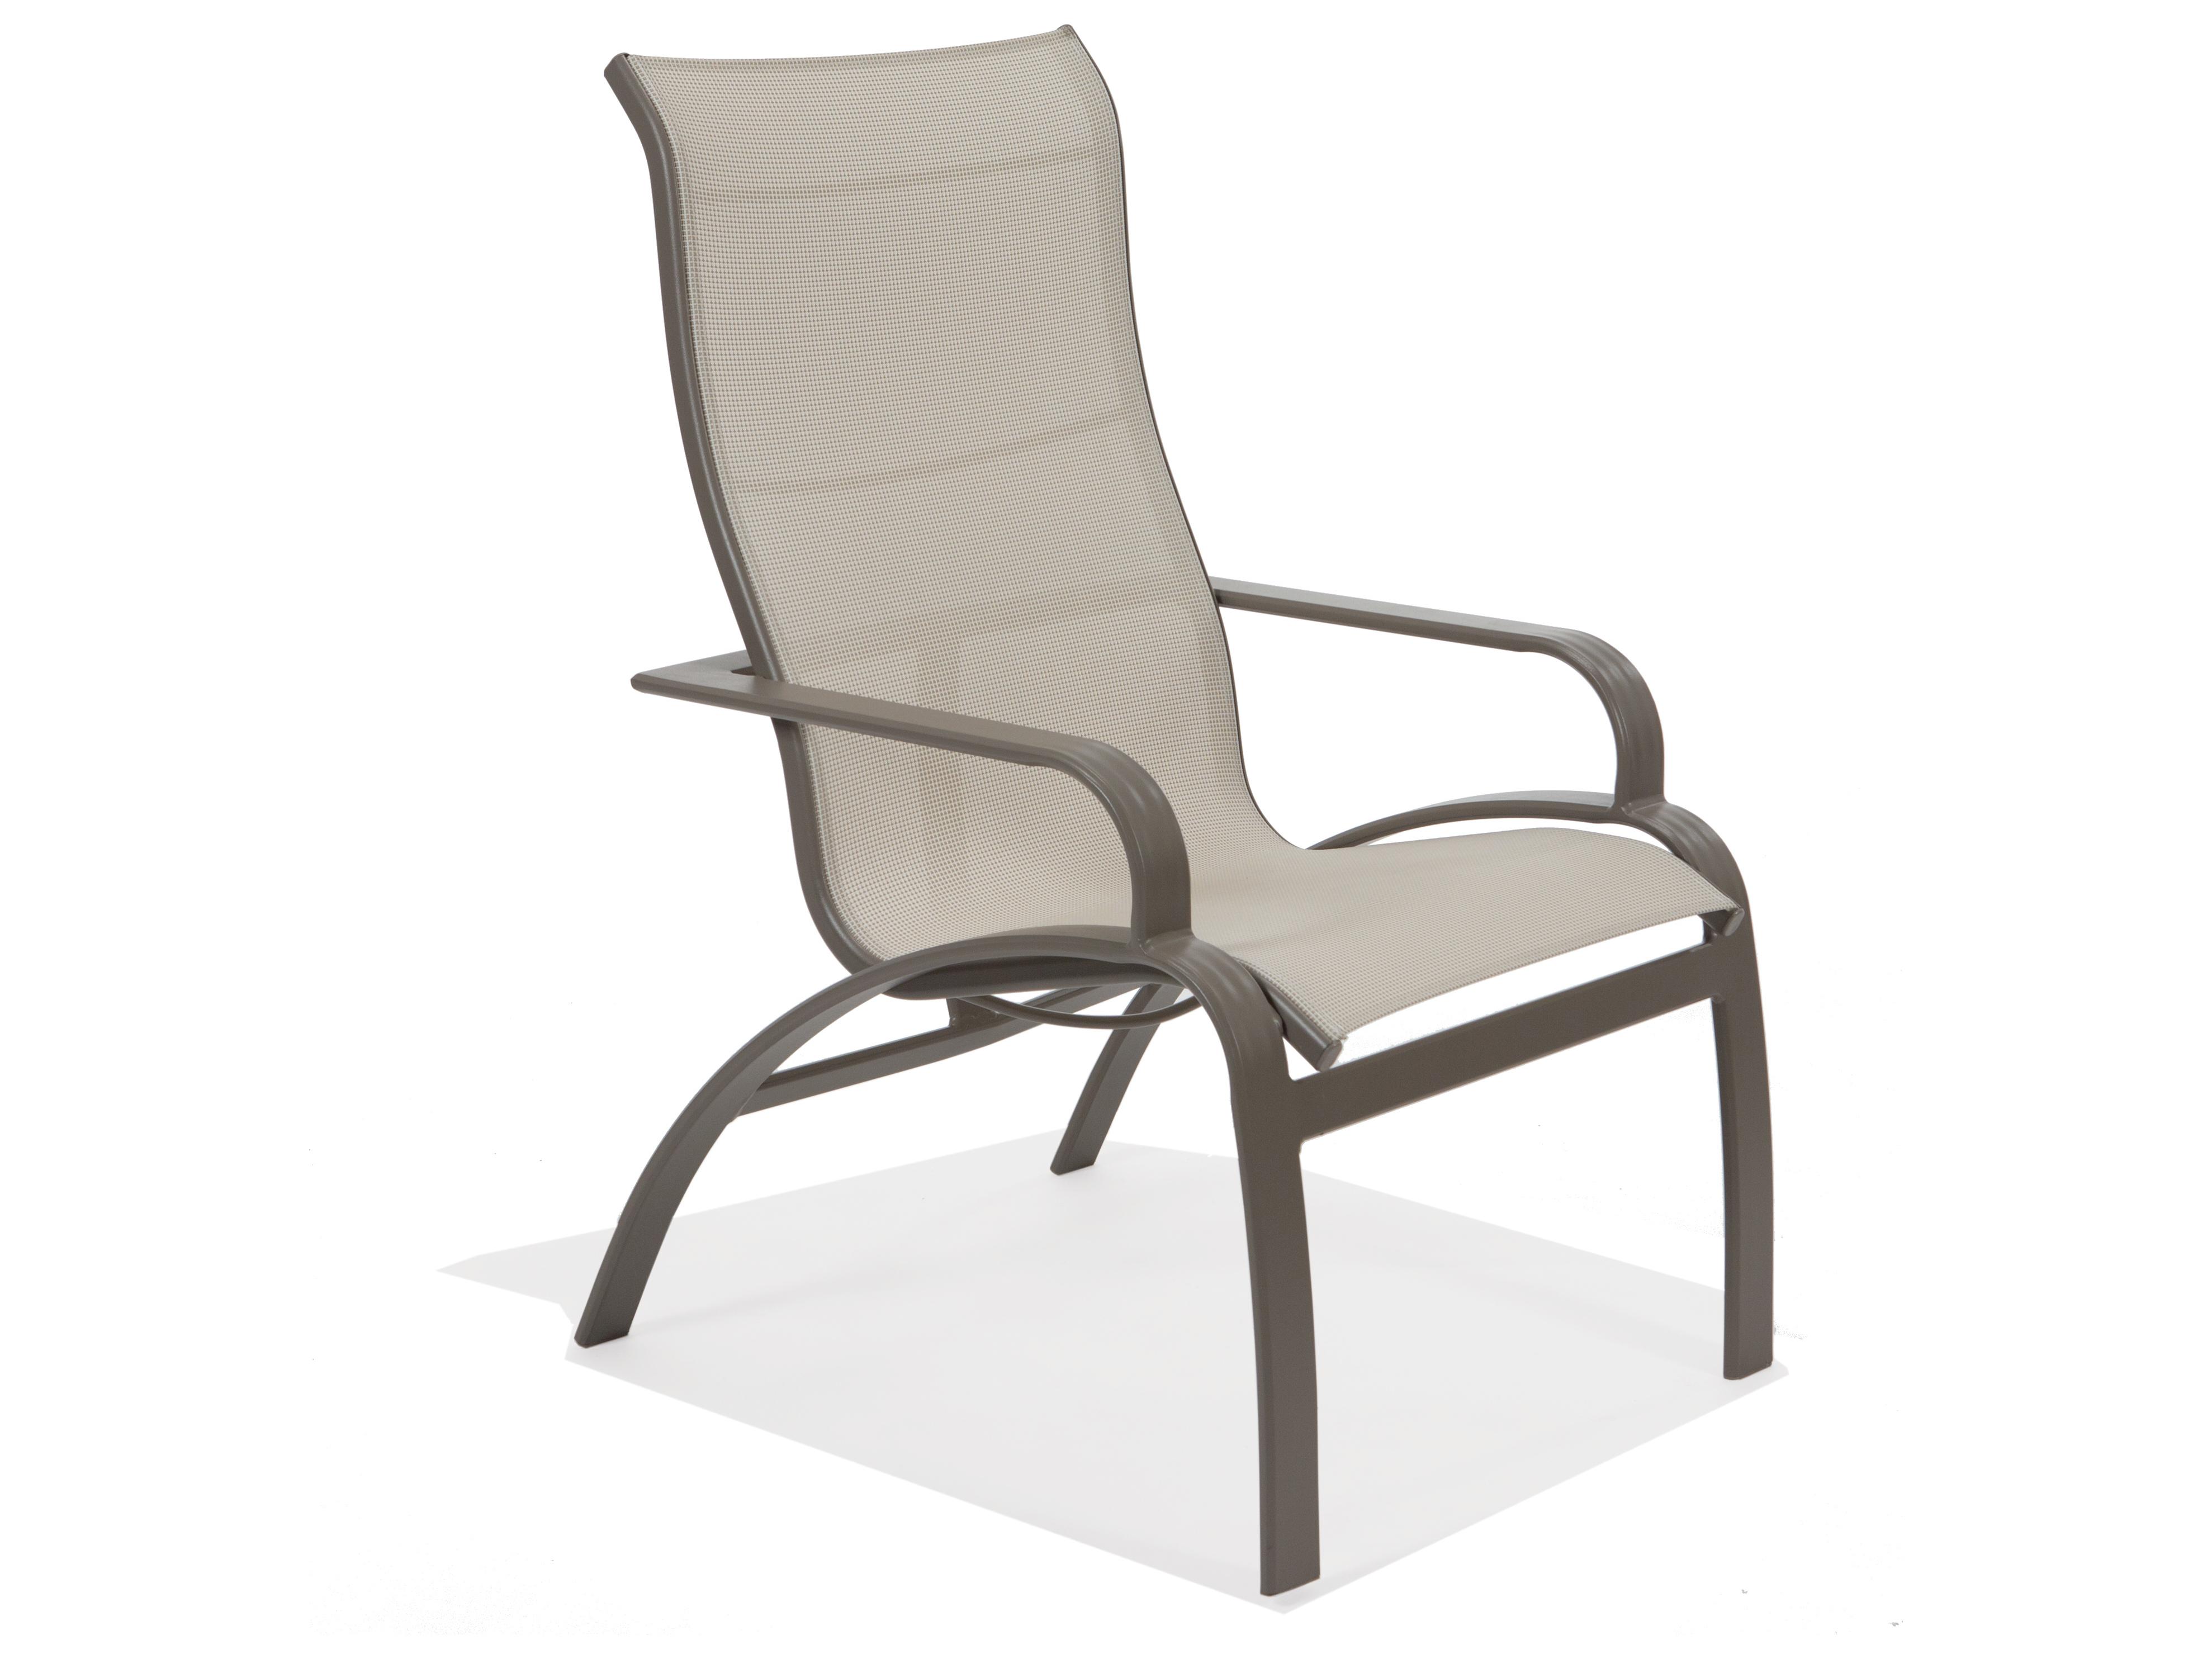 Winston Southern Cay Sling Aluminum Armless Chaise Lounge: Winston Evolution Sling Aluminum Ultimate High Back Arm